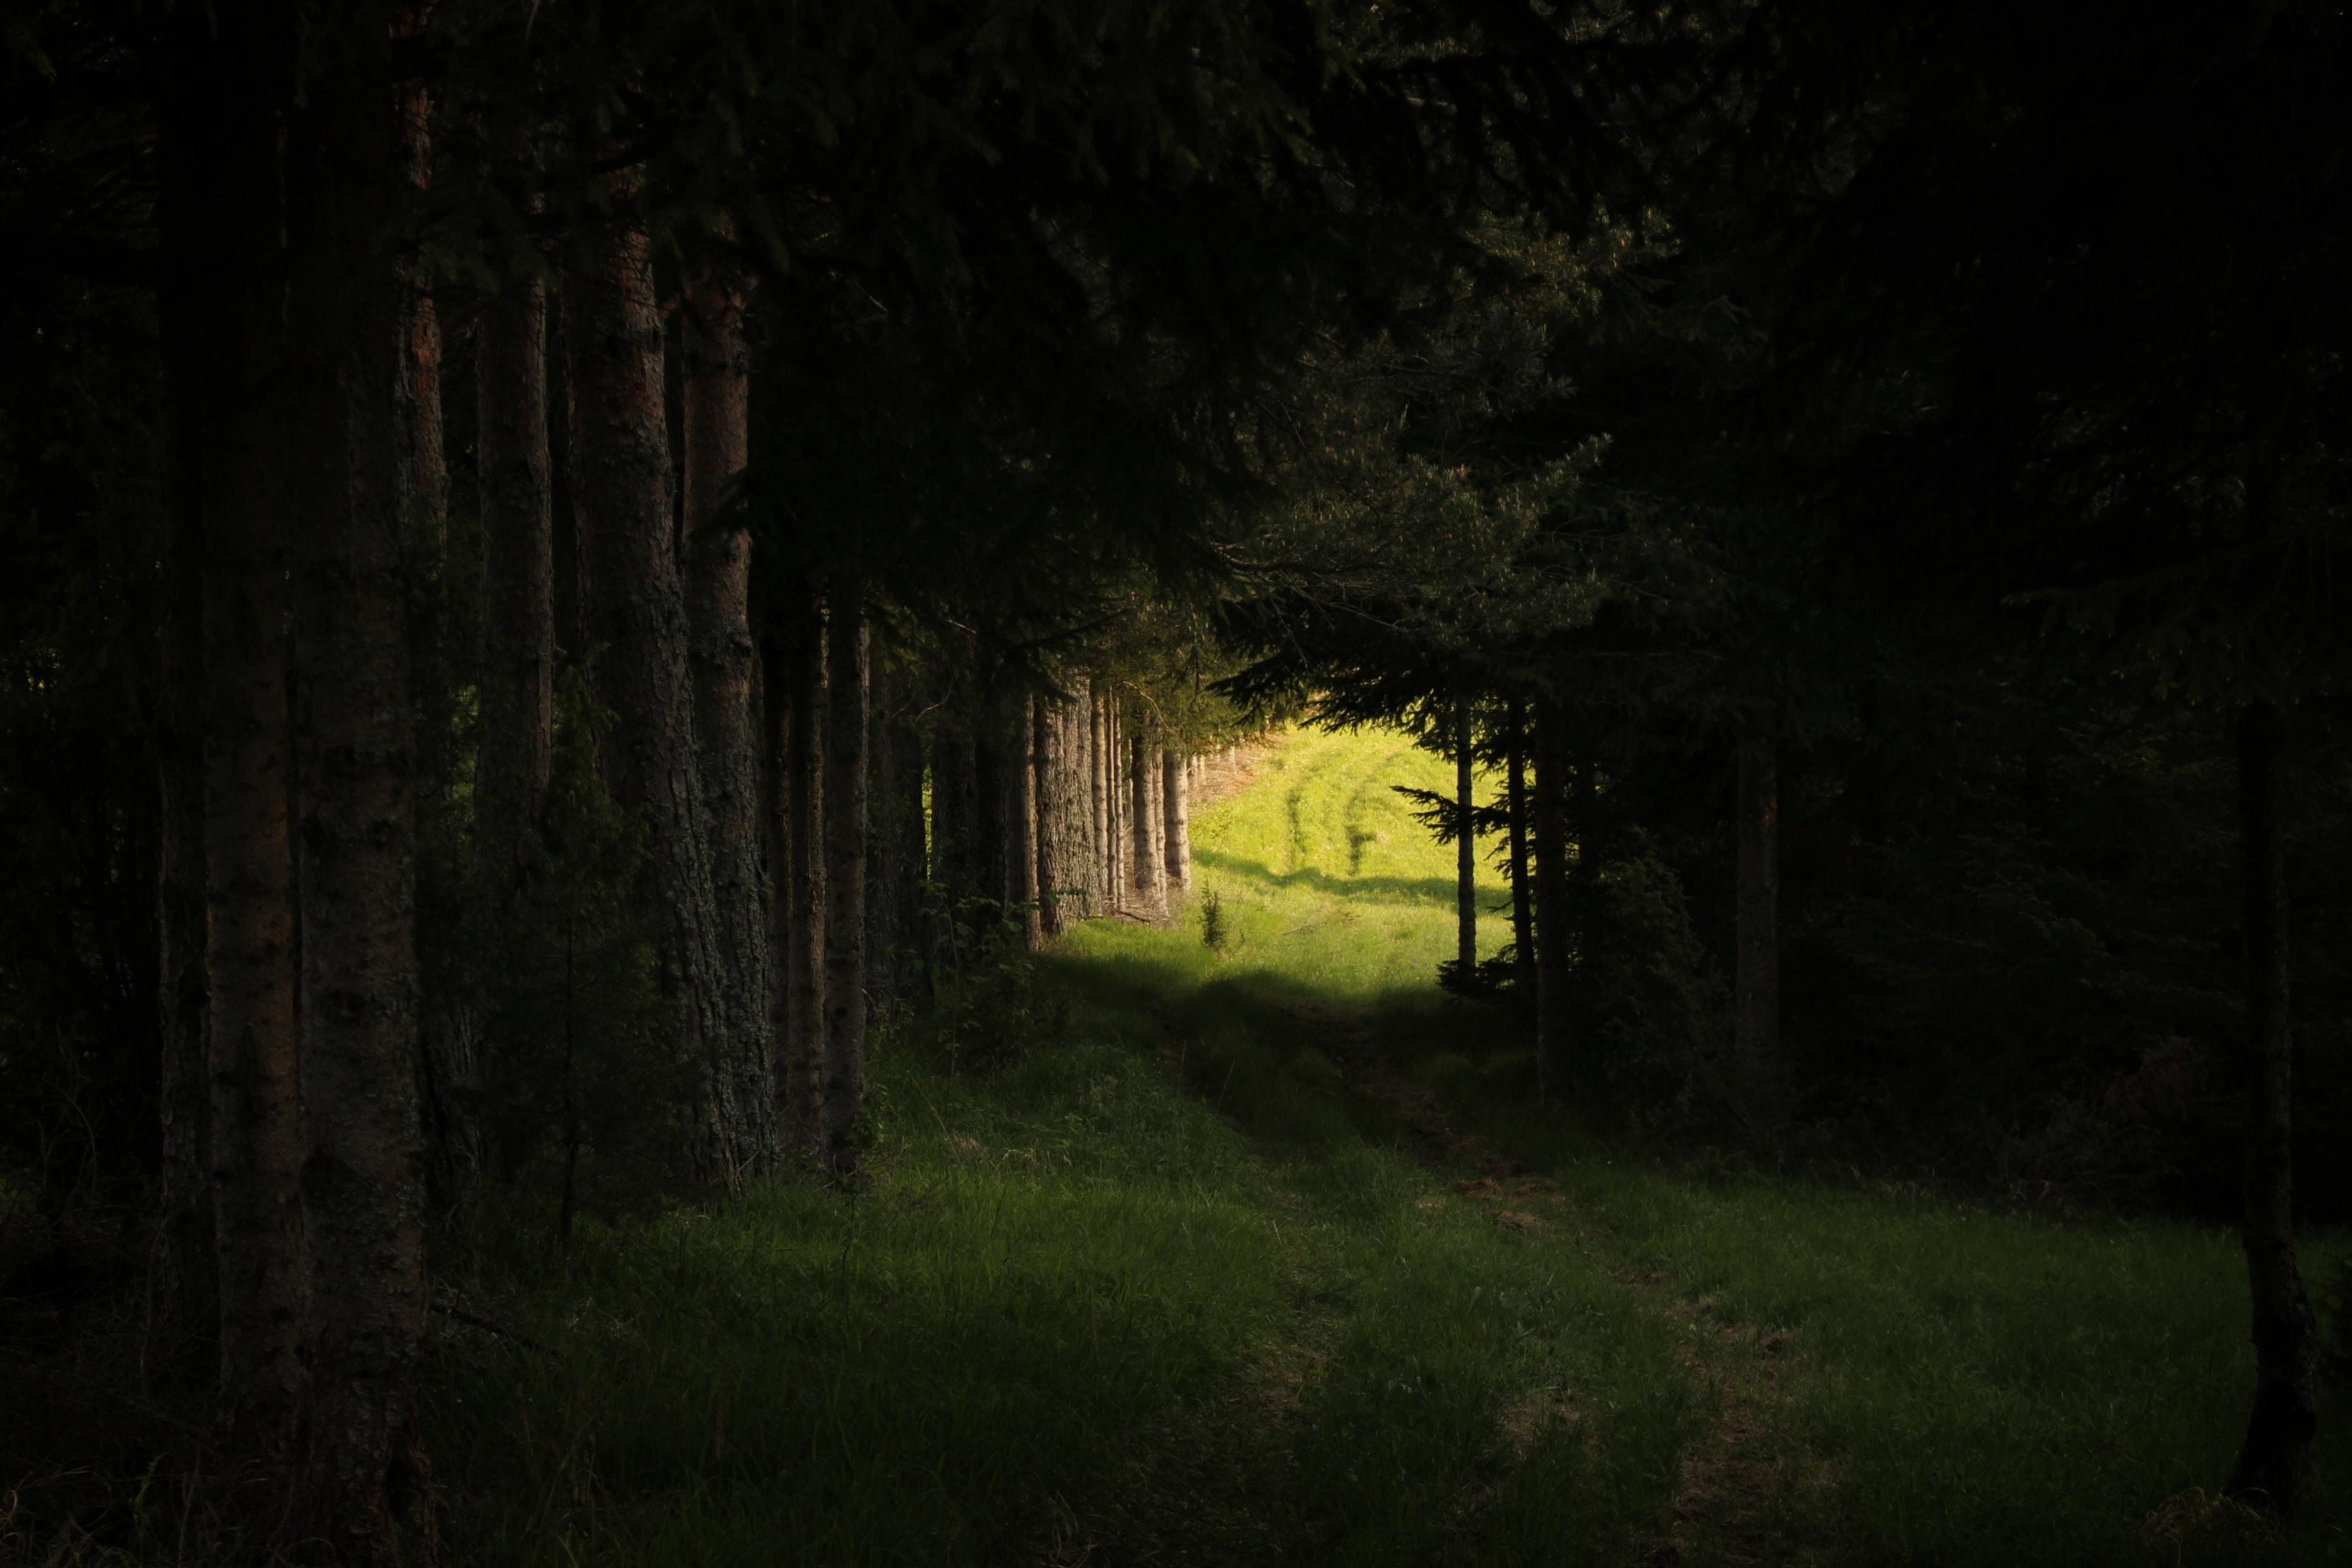 green trees near walkway